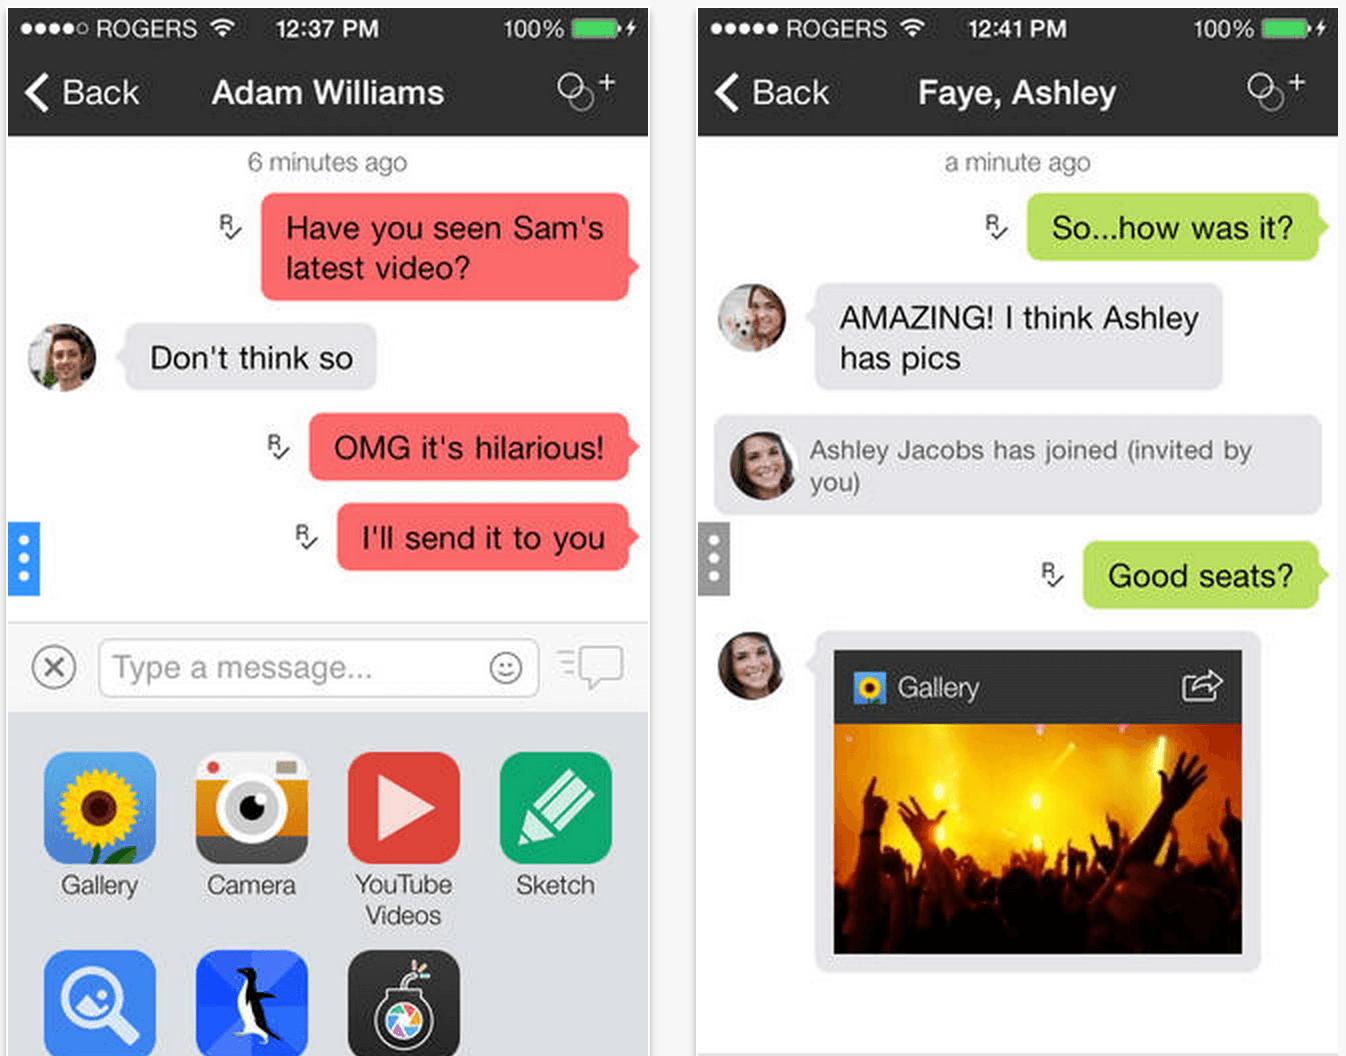 Risky Social networking apps — Kik Messenger